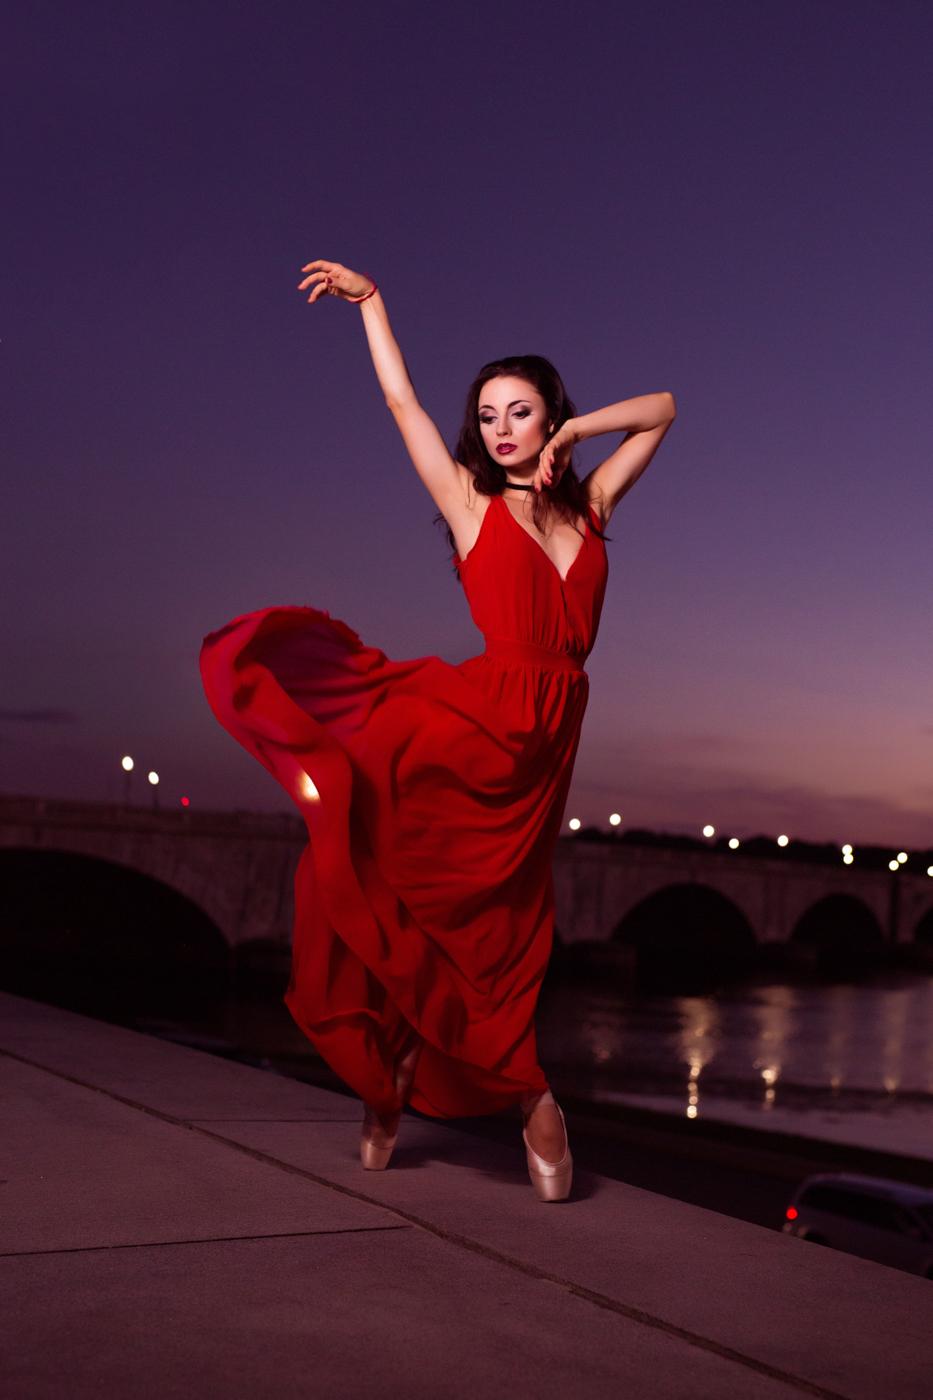 russian-ballet-dancer-on-the-street-of-washington-dc-ksenia-pro-photography-7